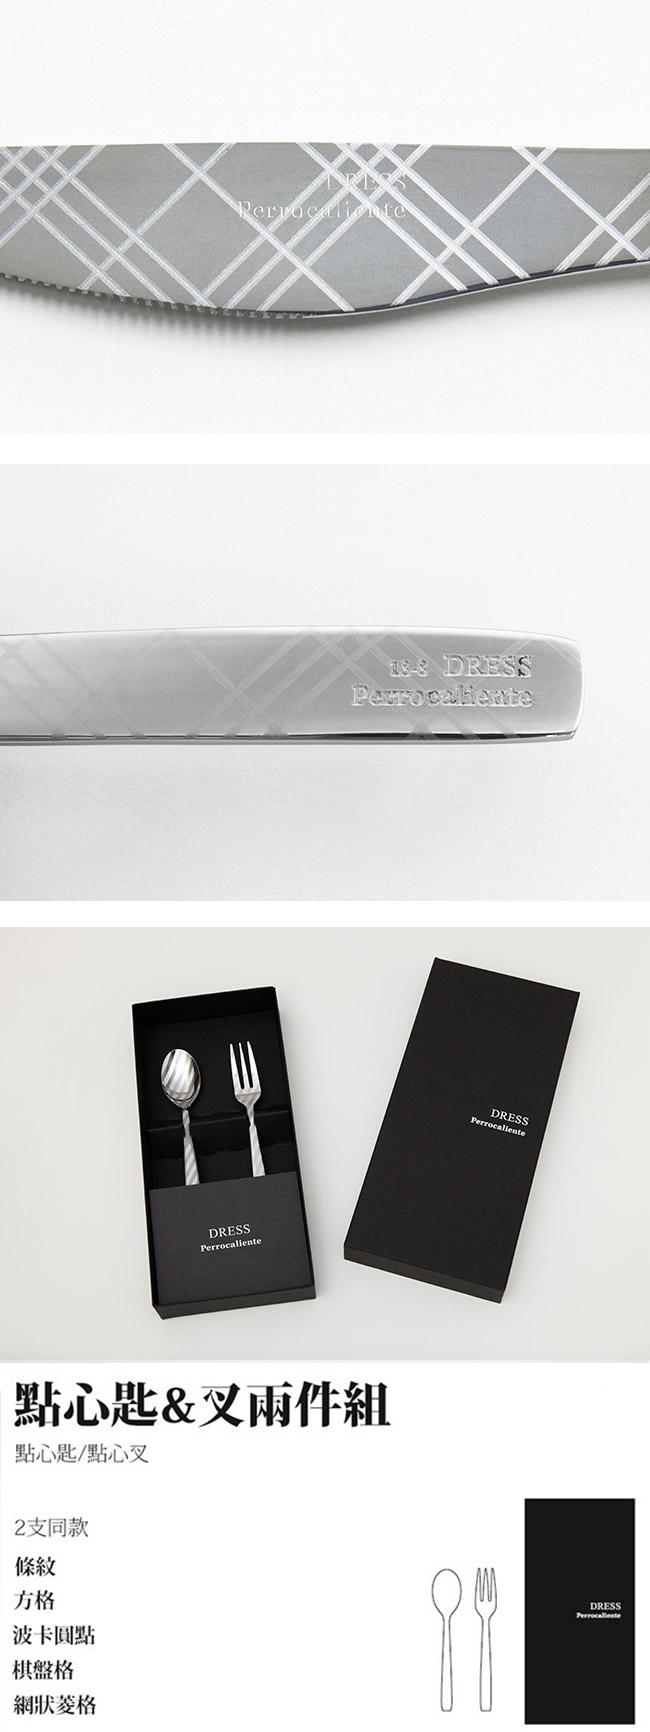 Perrocaliente Dress Gift Set 銀色盒裝餐具組 點心匙&叉兩件組 方格